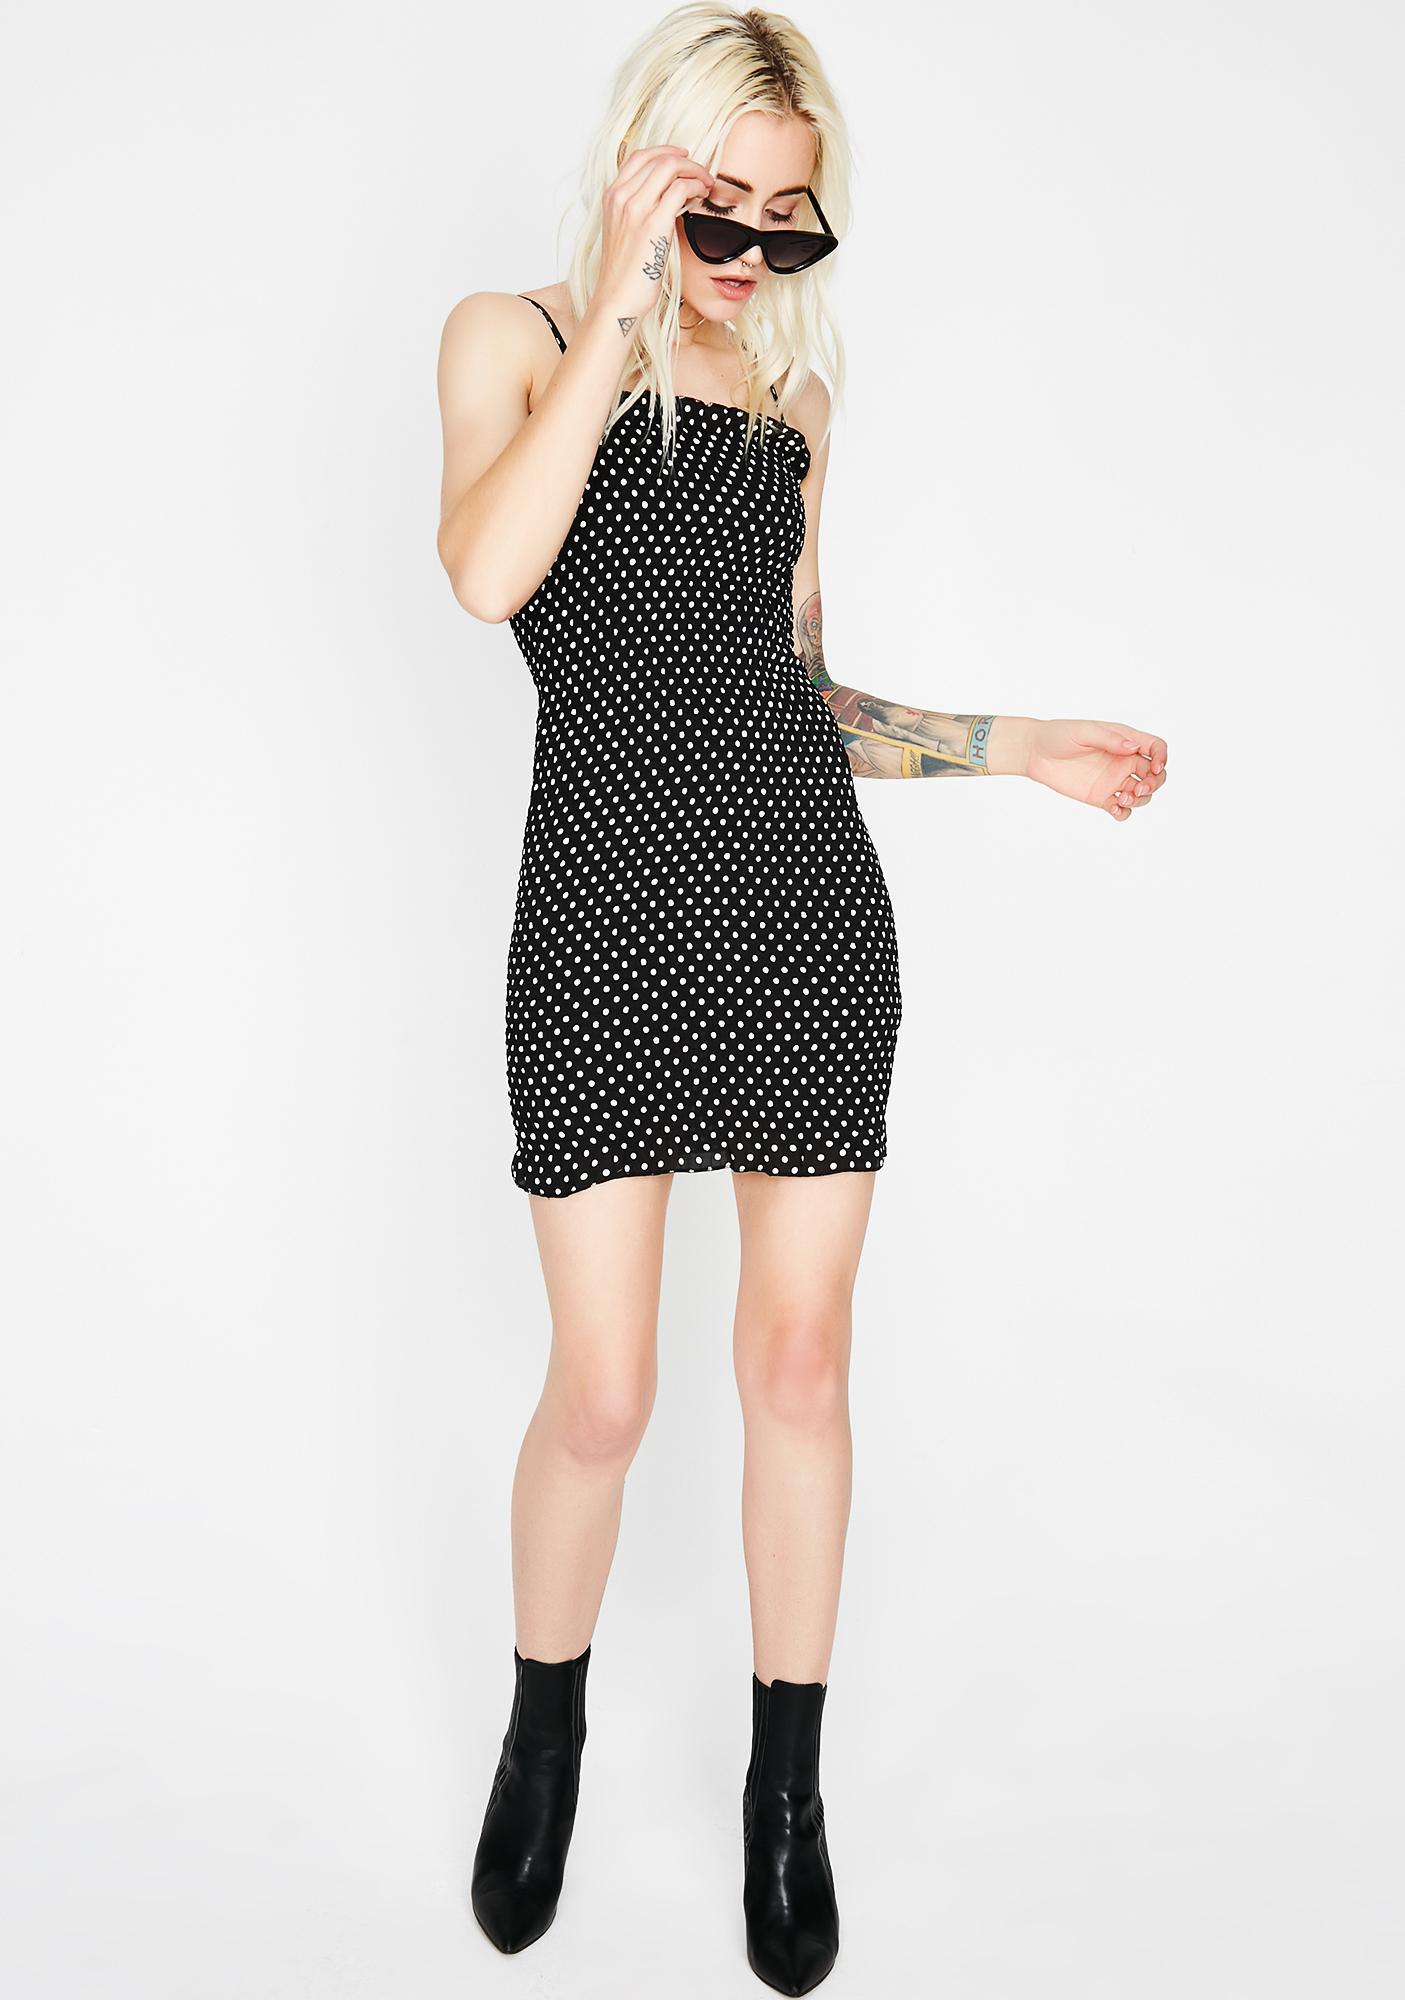 Ink Hard Candy Mini Dress